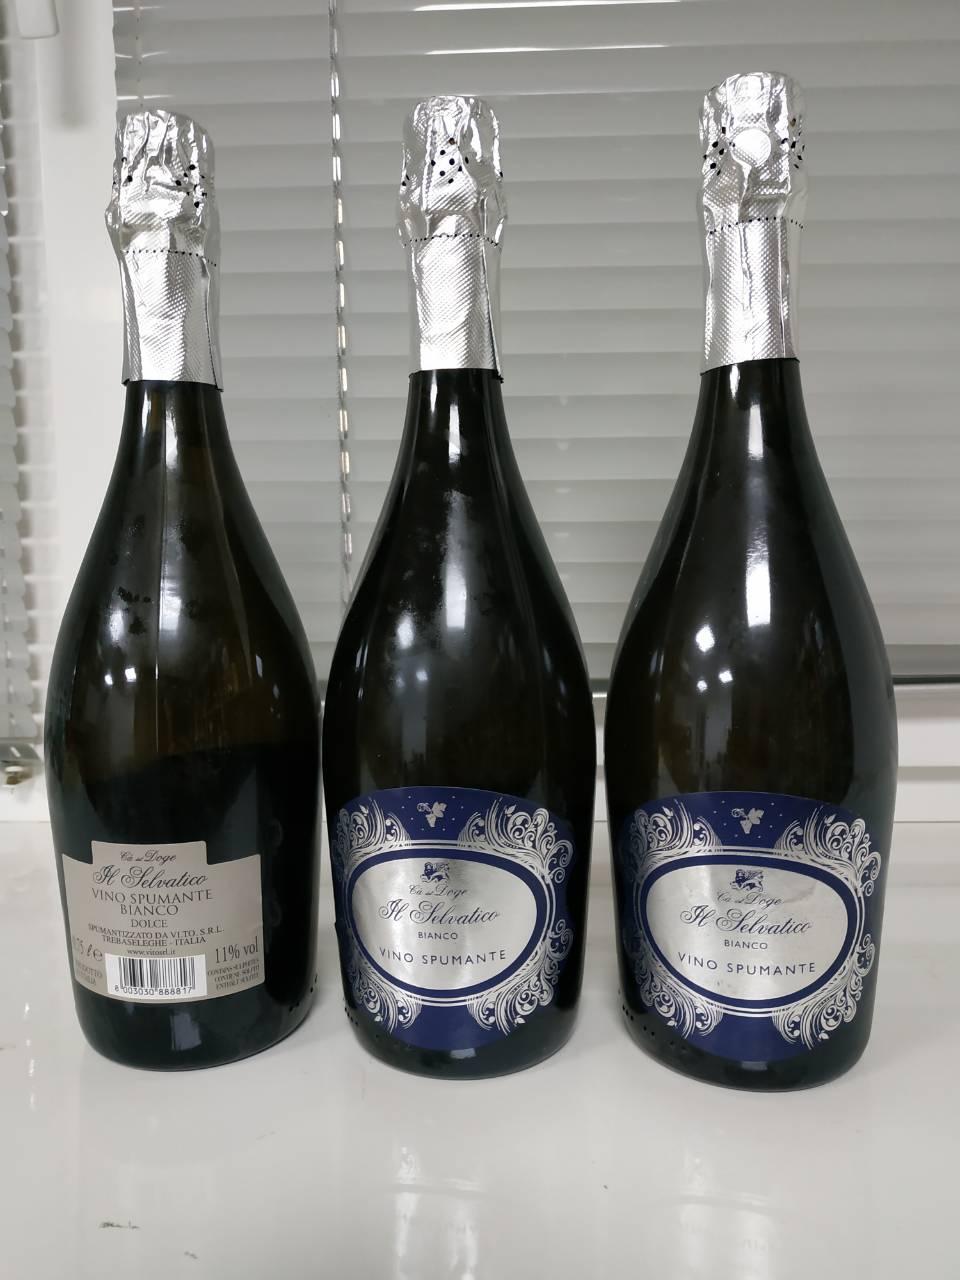 "Вино игристое белое сладкое ""Il Selvatico Spumante"" Dolce 11% 0,75л"